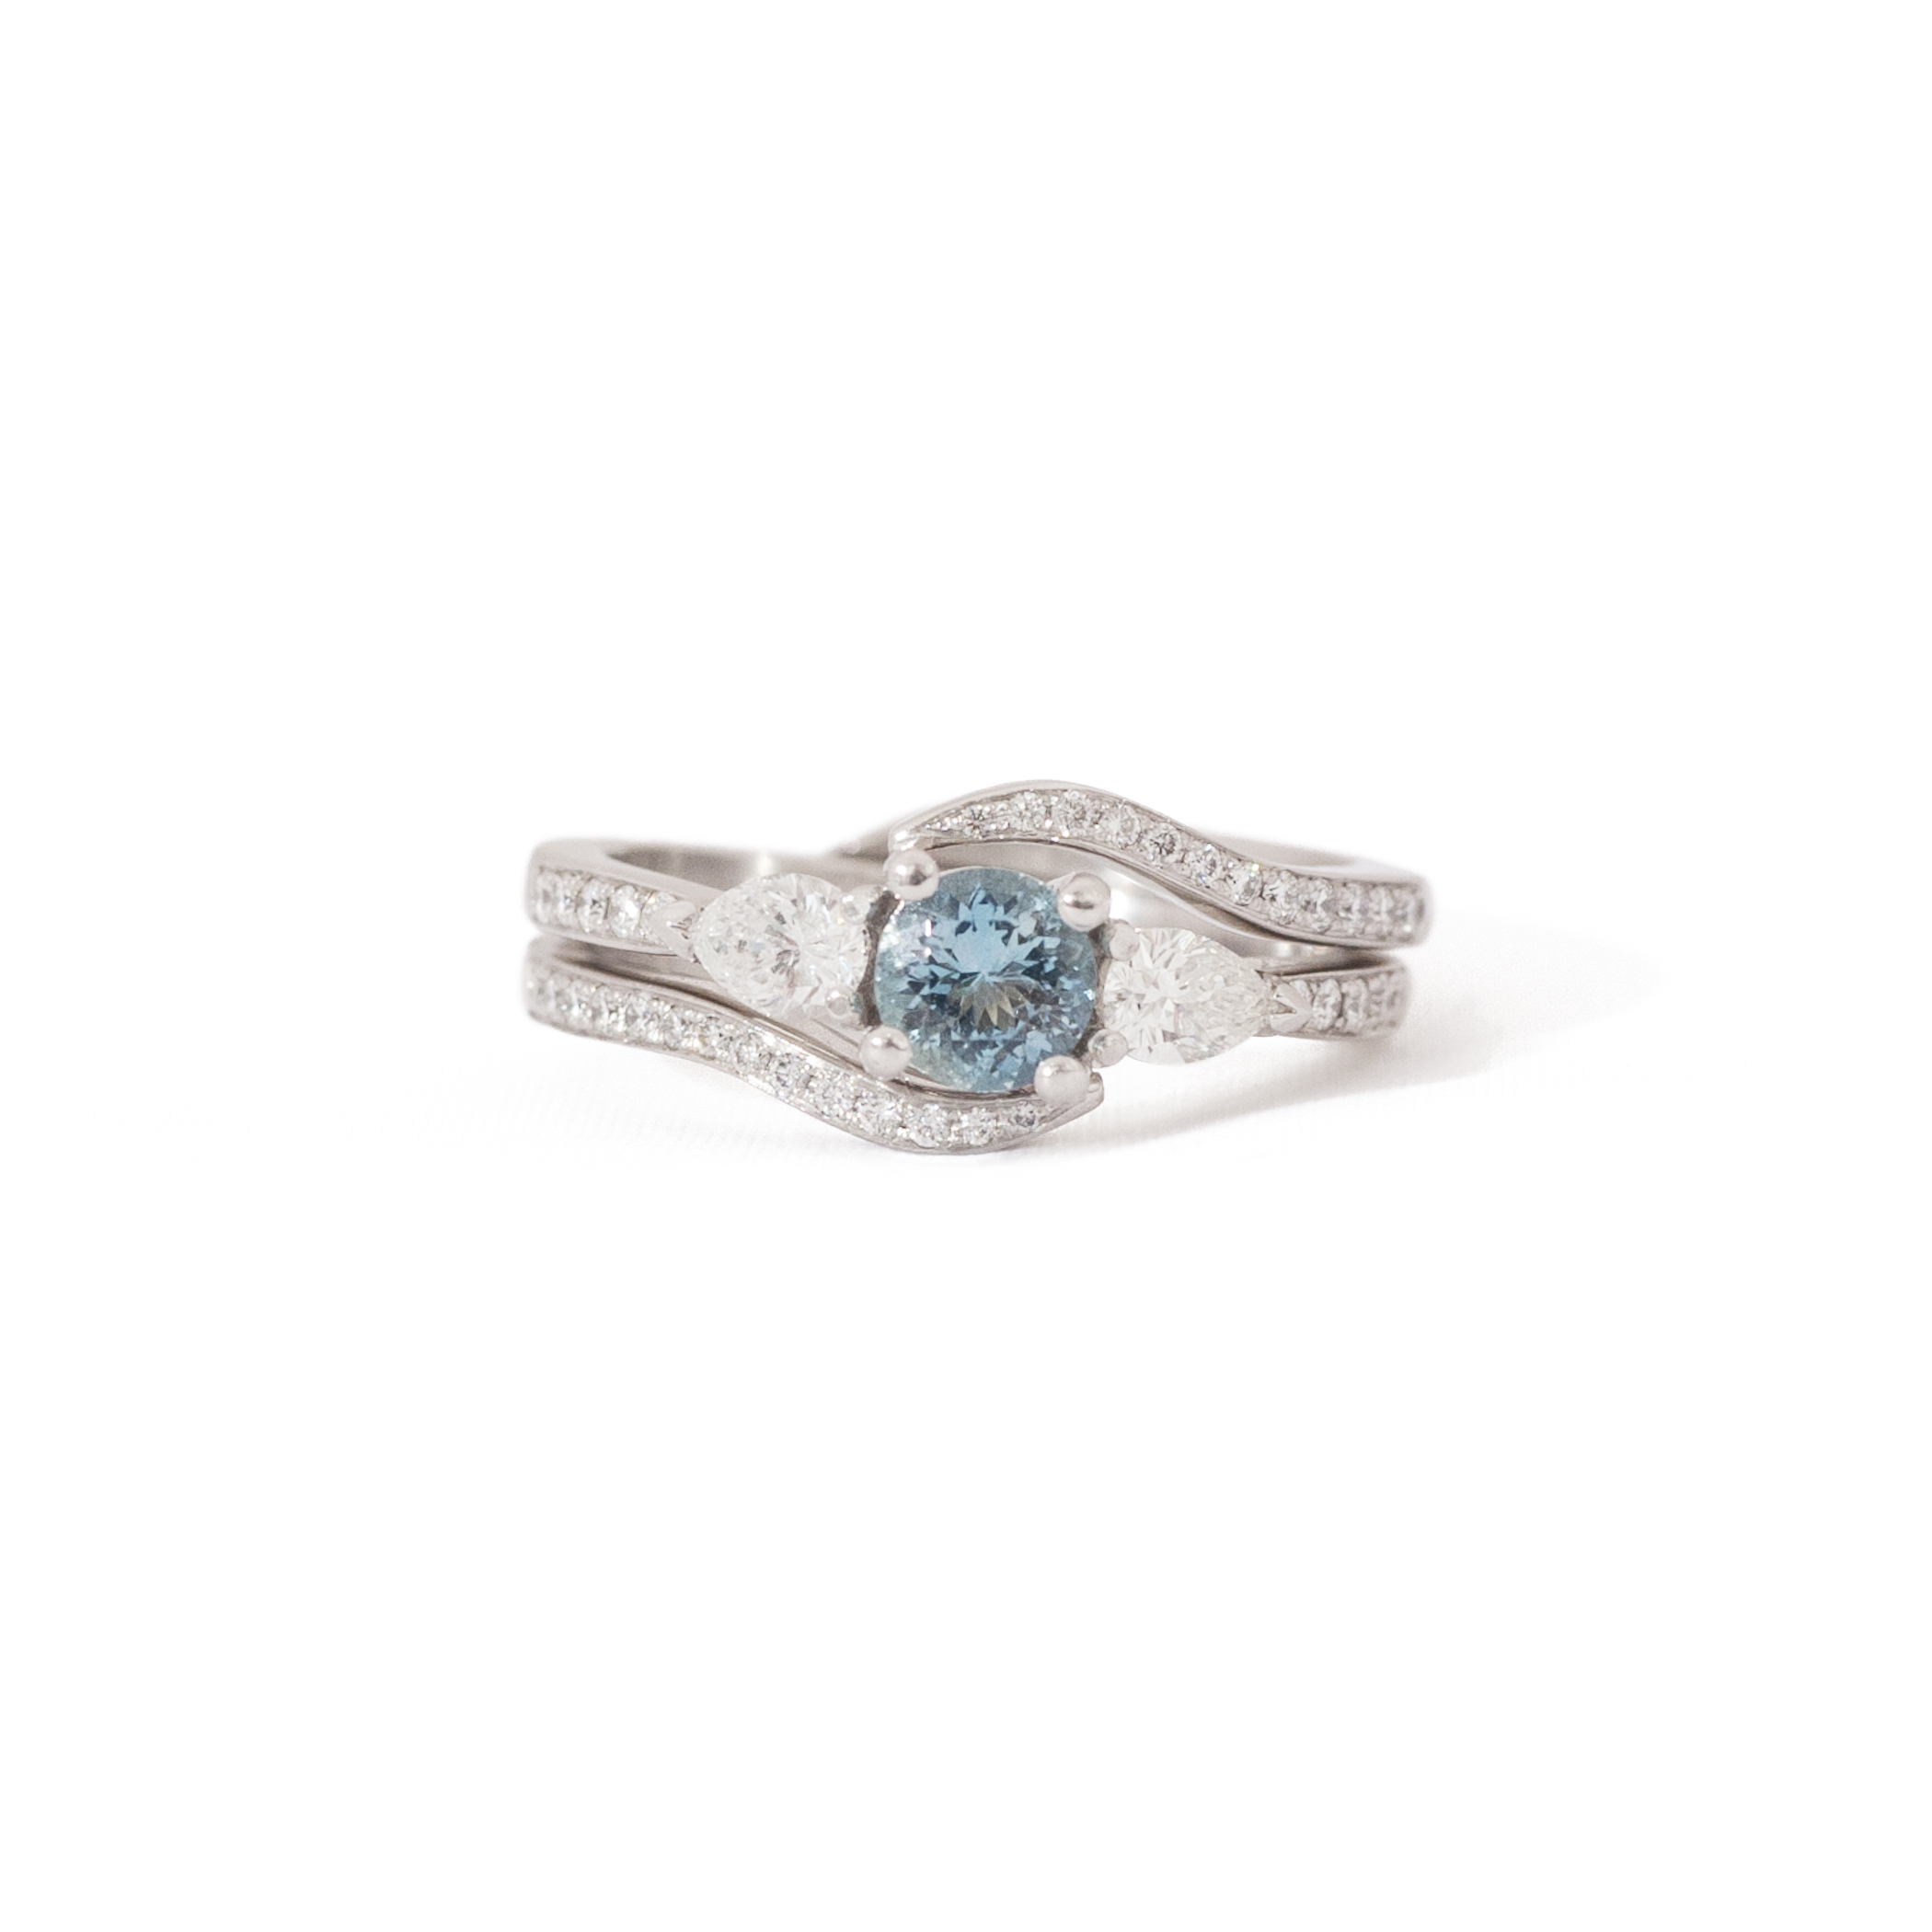 Jamie's Custom Wedding Bands & Engagement Ring